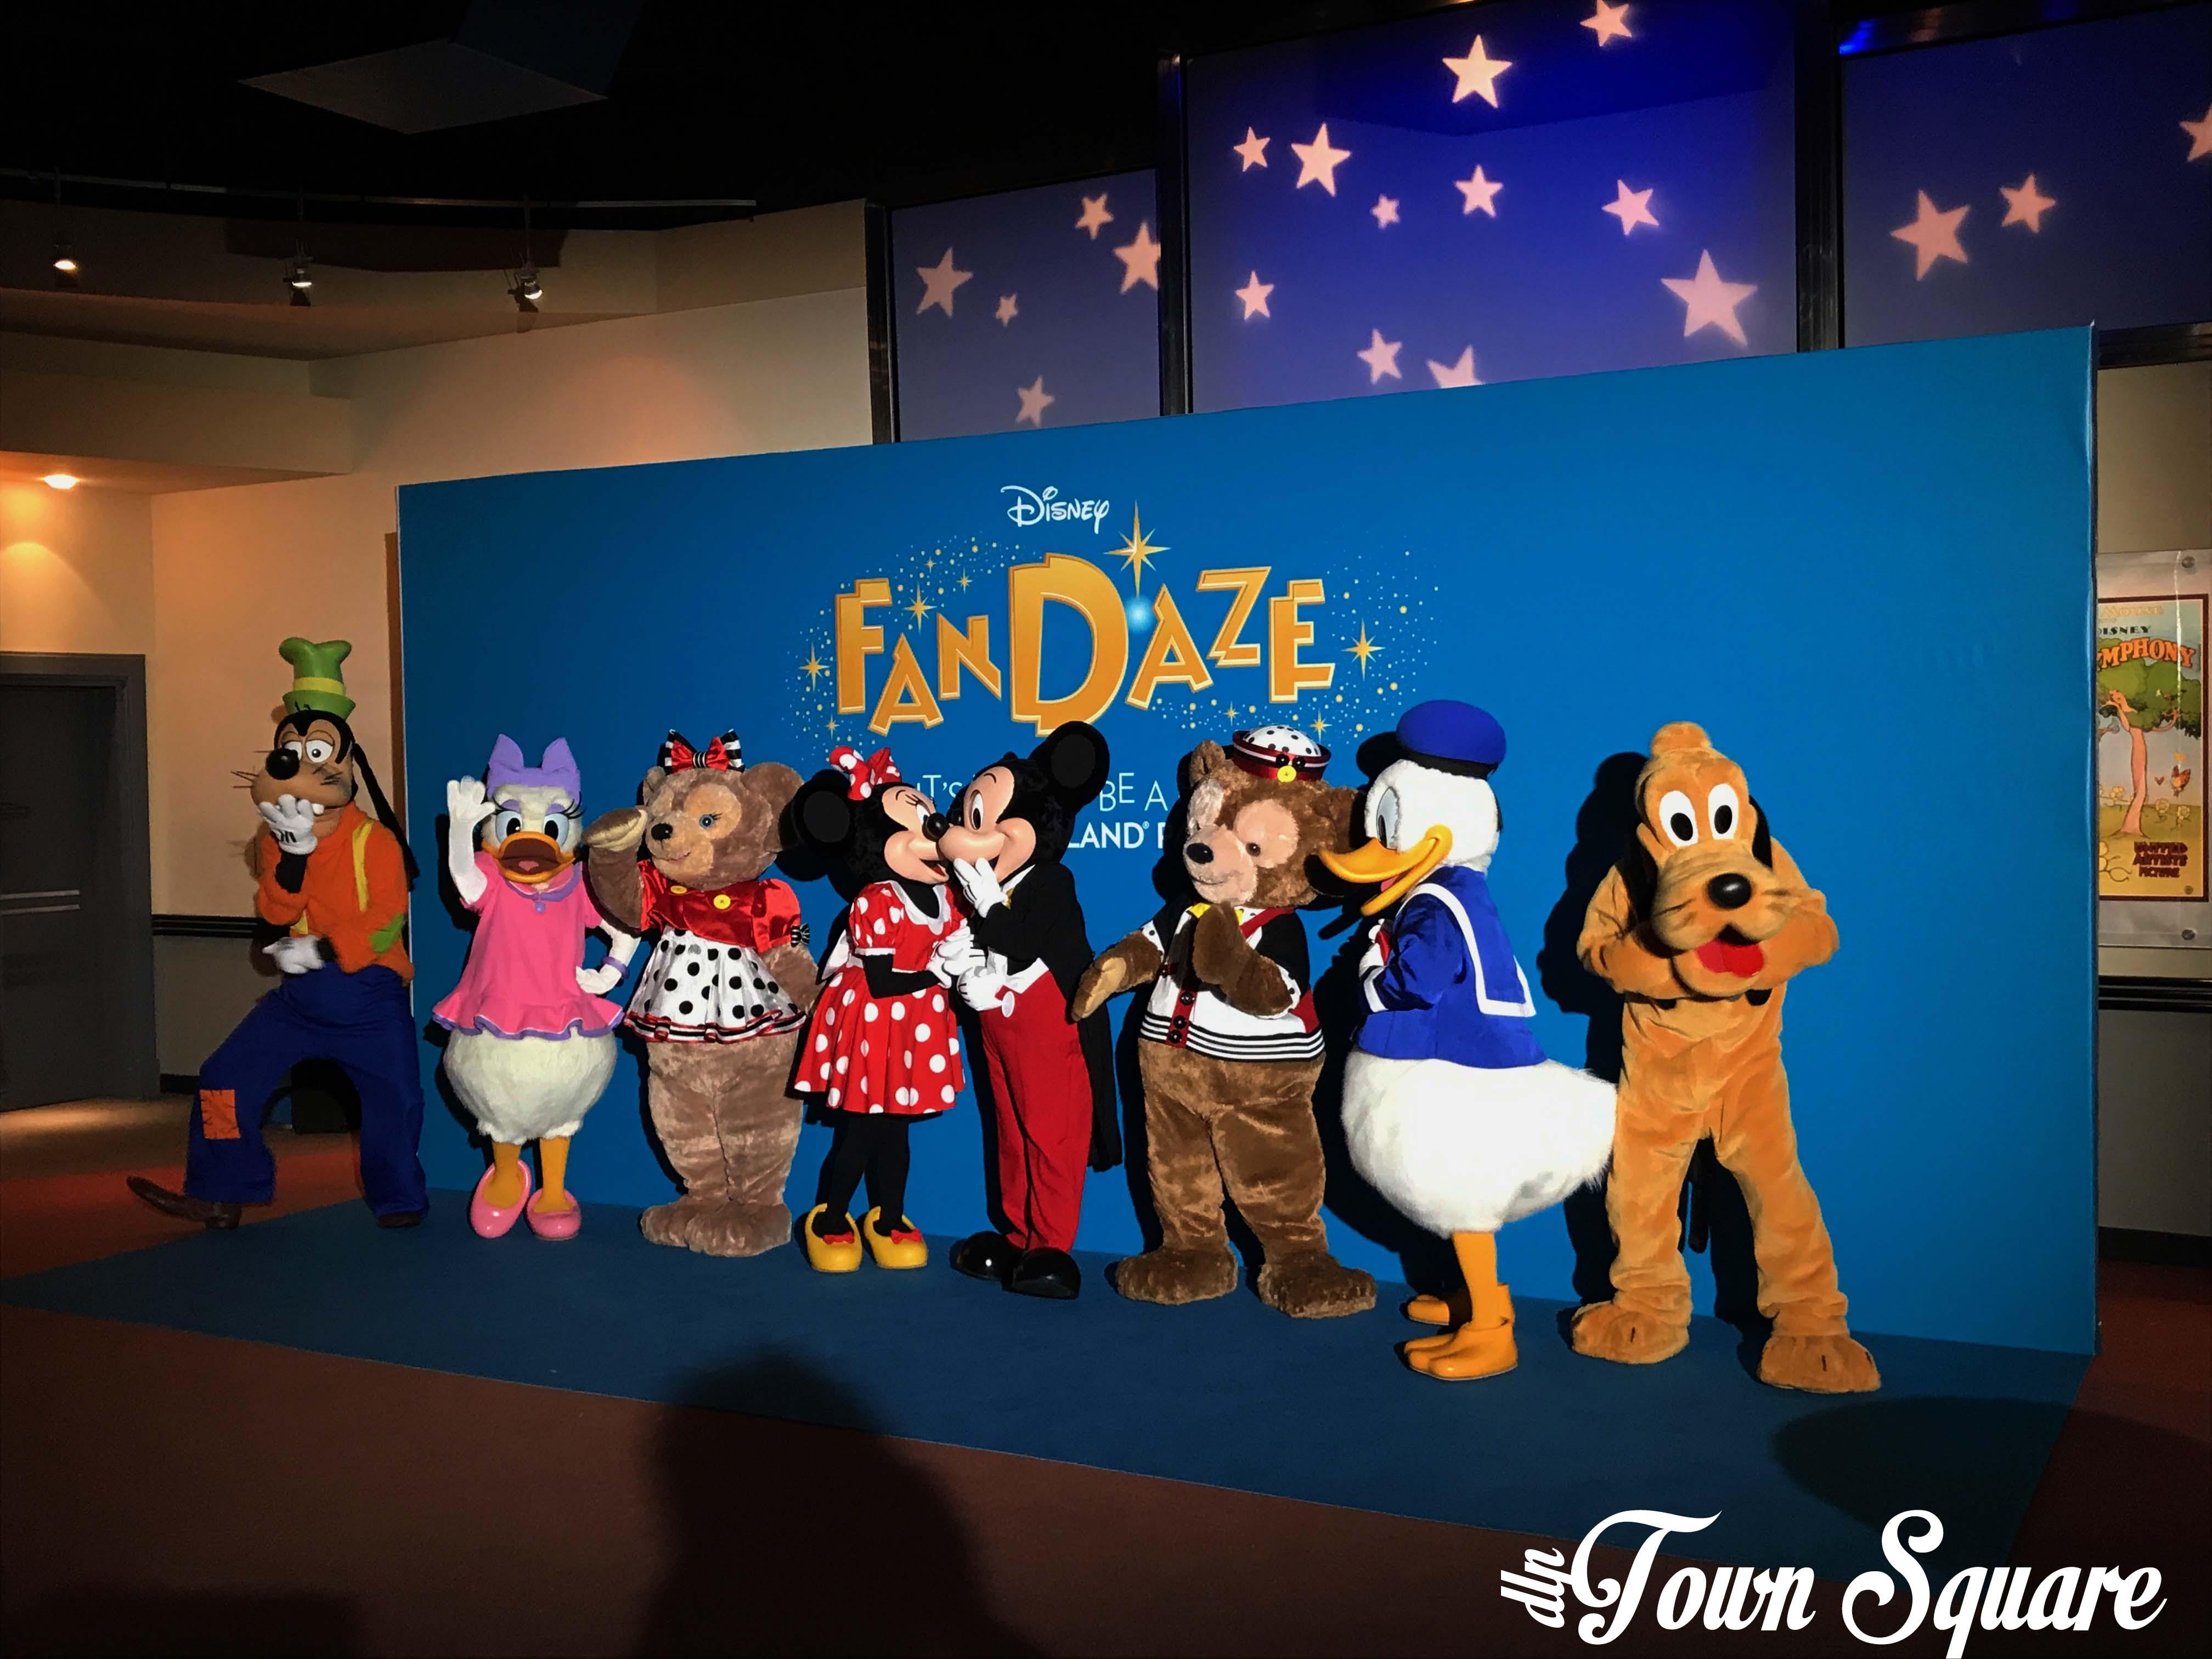 The Disney FanDaze Characters